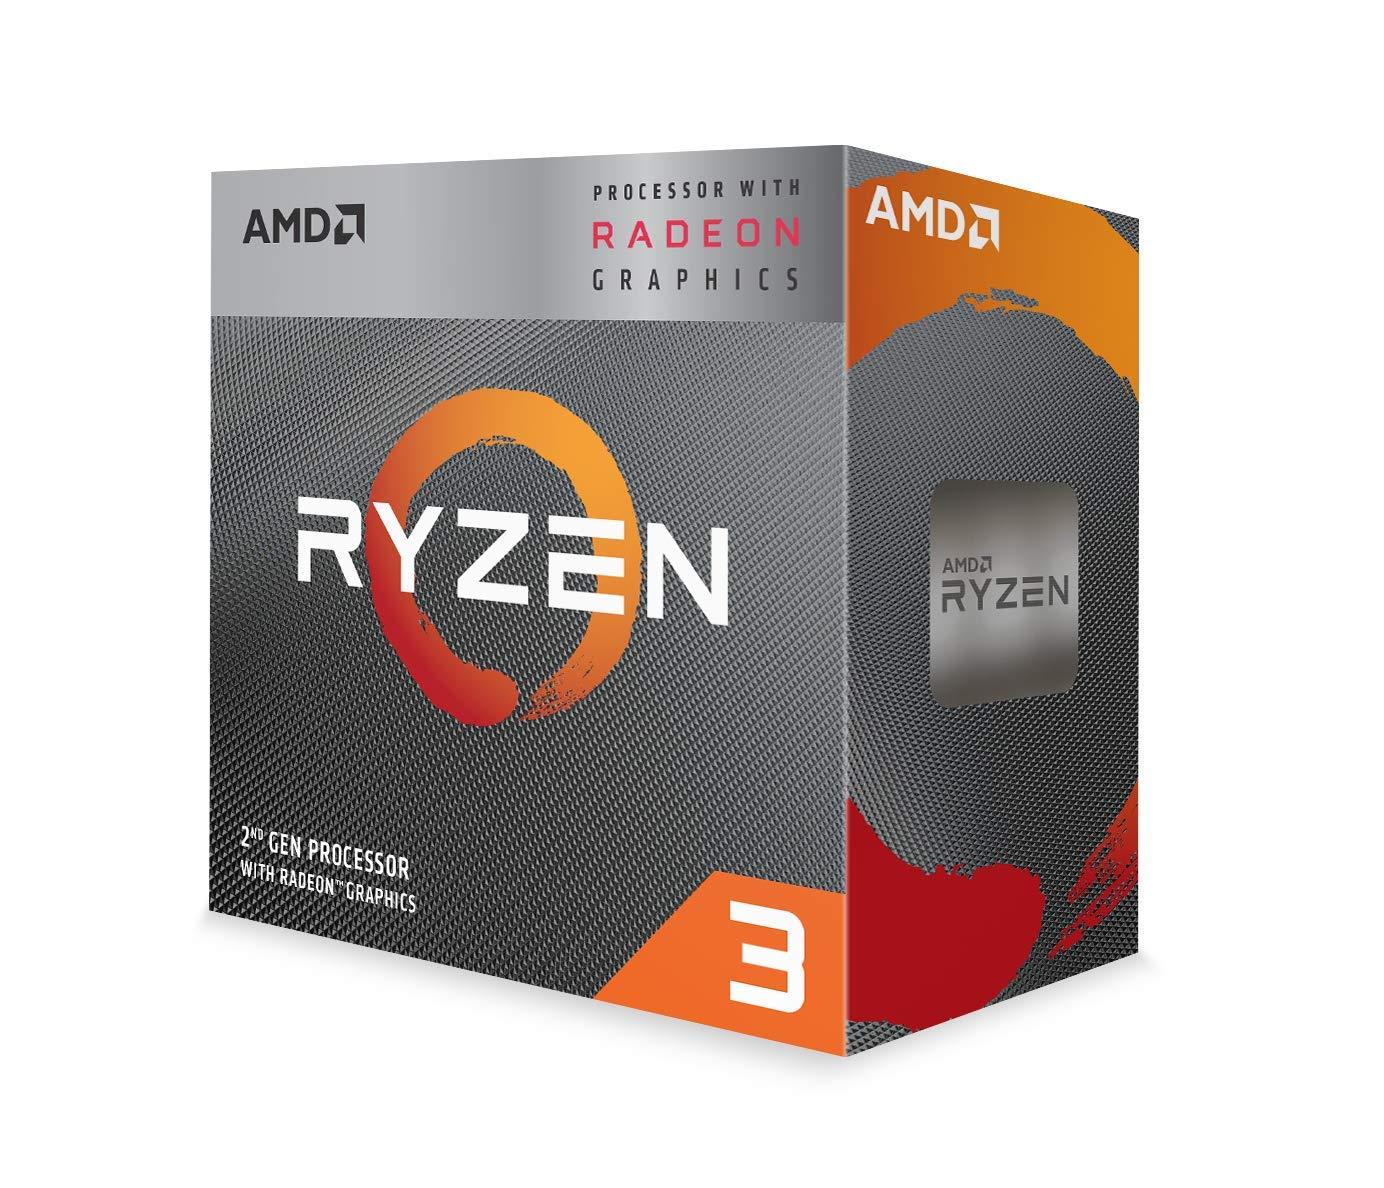 [Best] Gaming PC Build Under ₹30,000 in India [Apr. 2021] 3